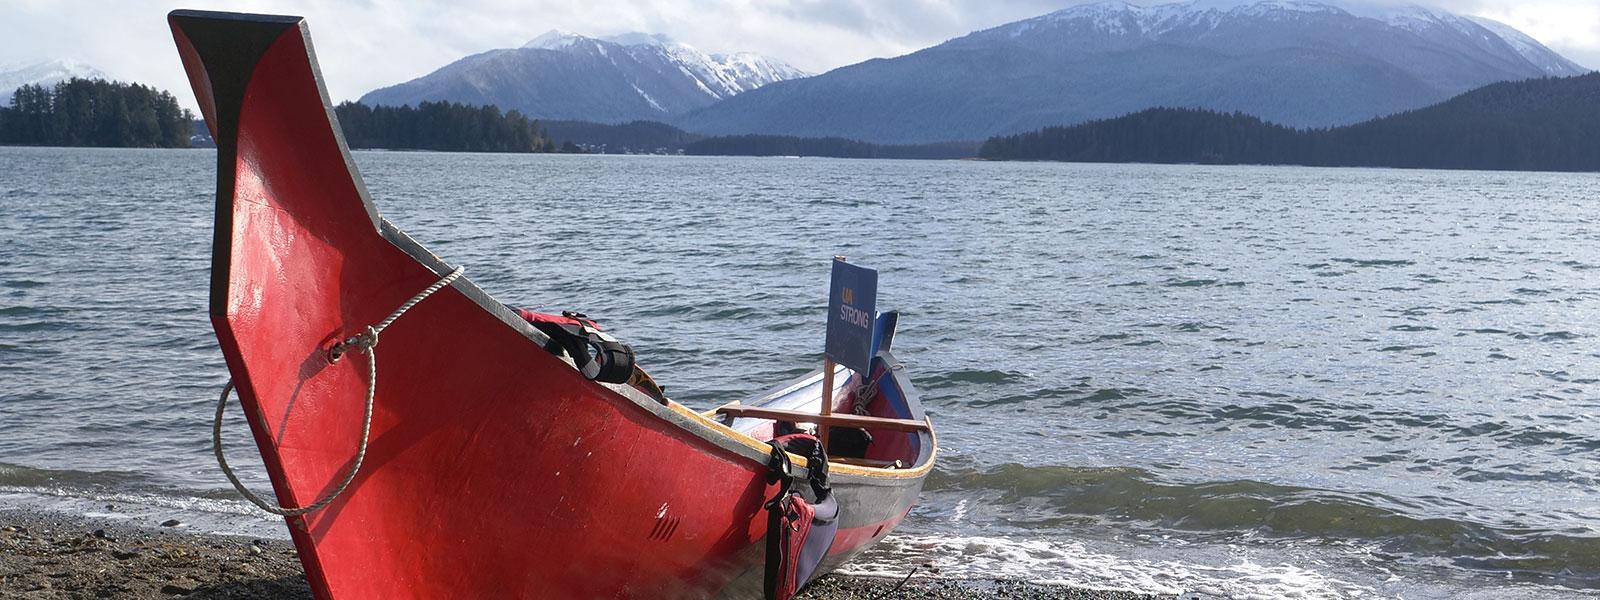 Jibba dugout canoe by Wayne Price / Photo: Pat Race